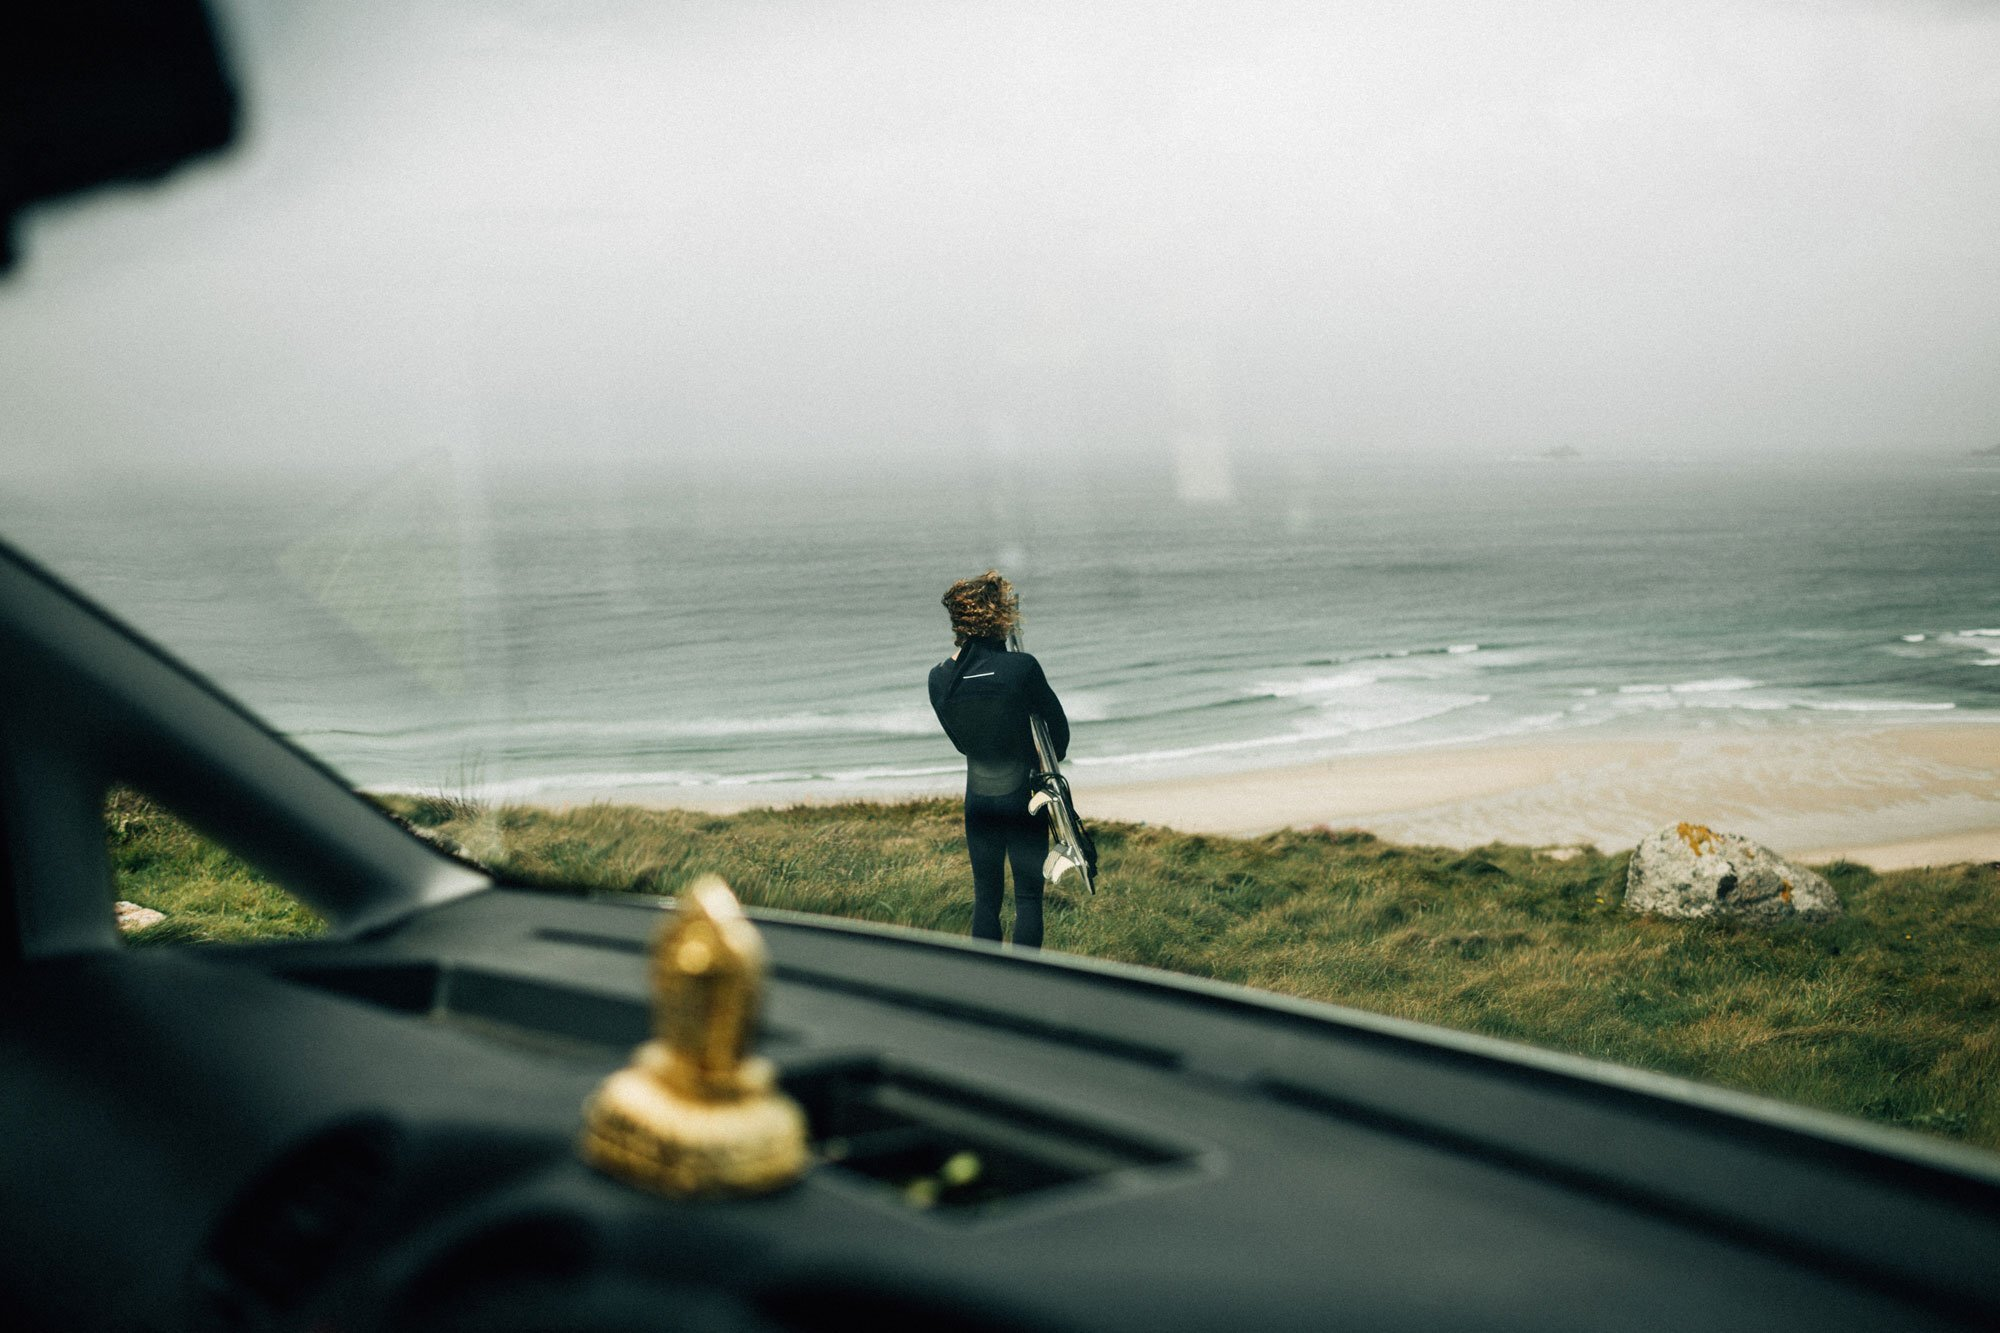 Pete-Geall-Getting-ready-to-surf-sennen.jpg